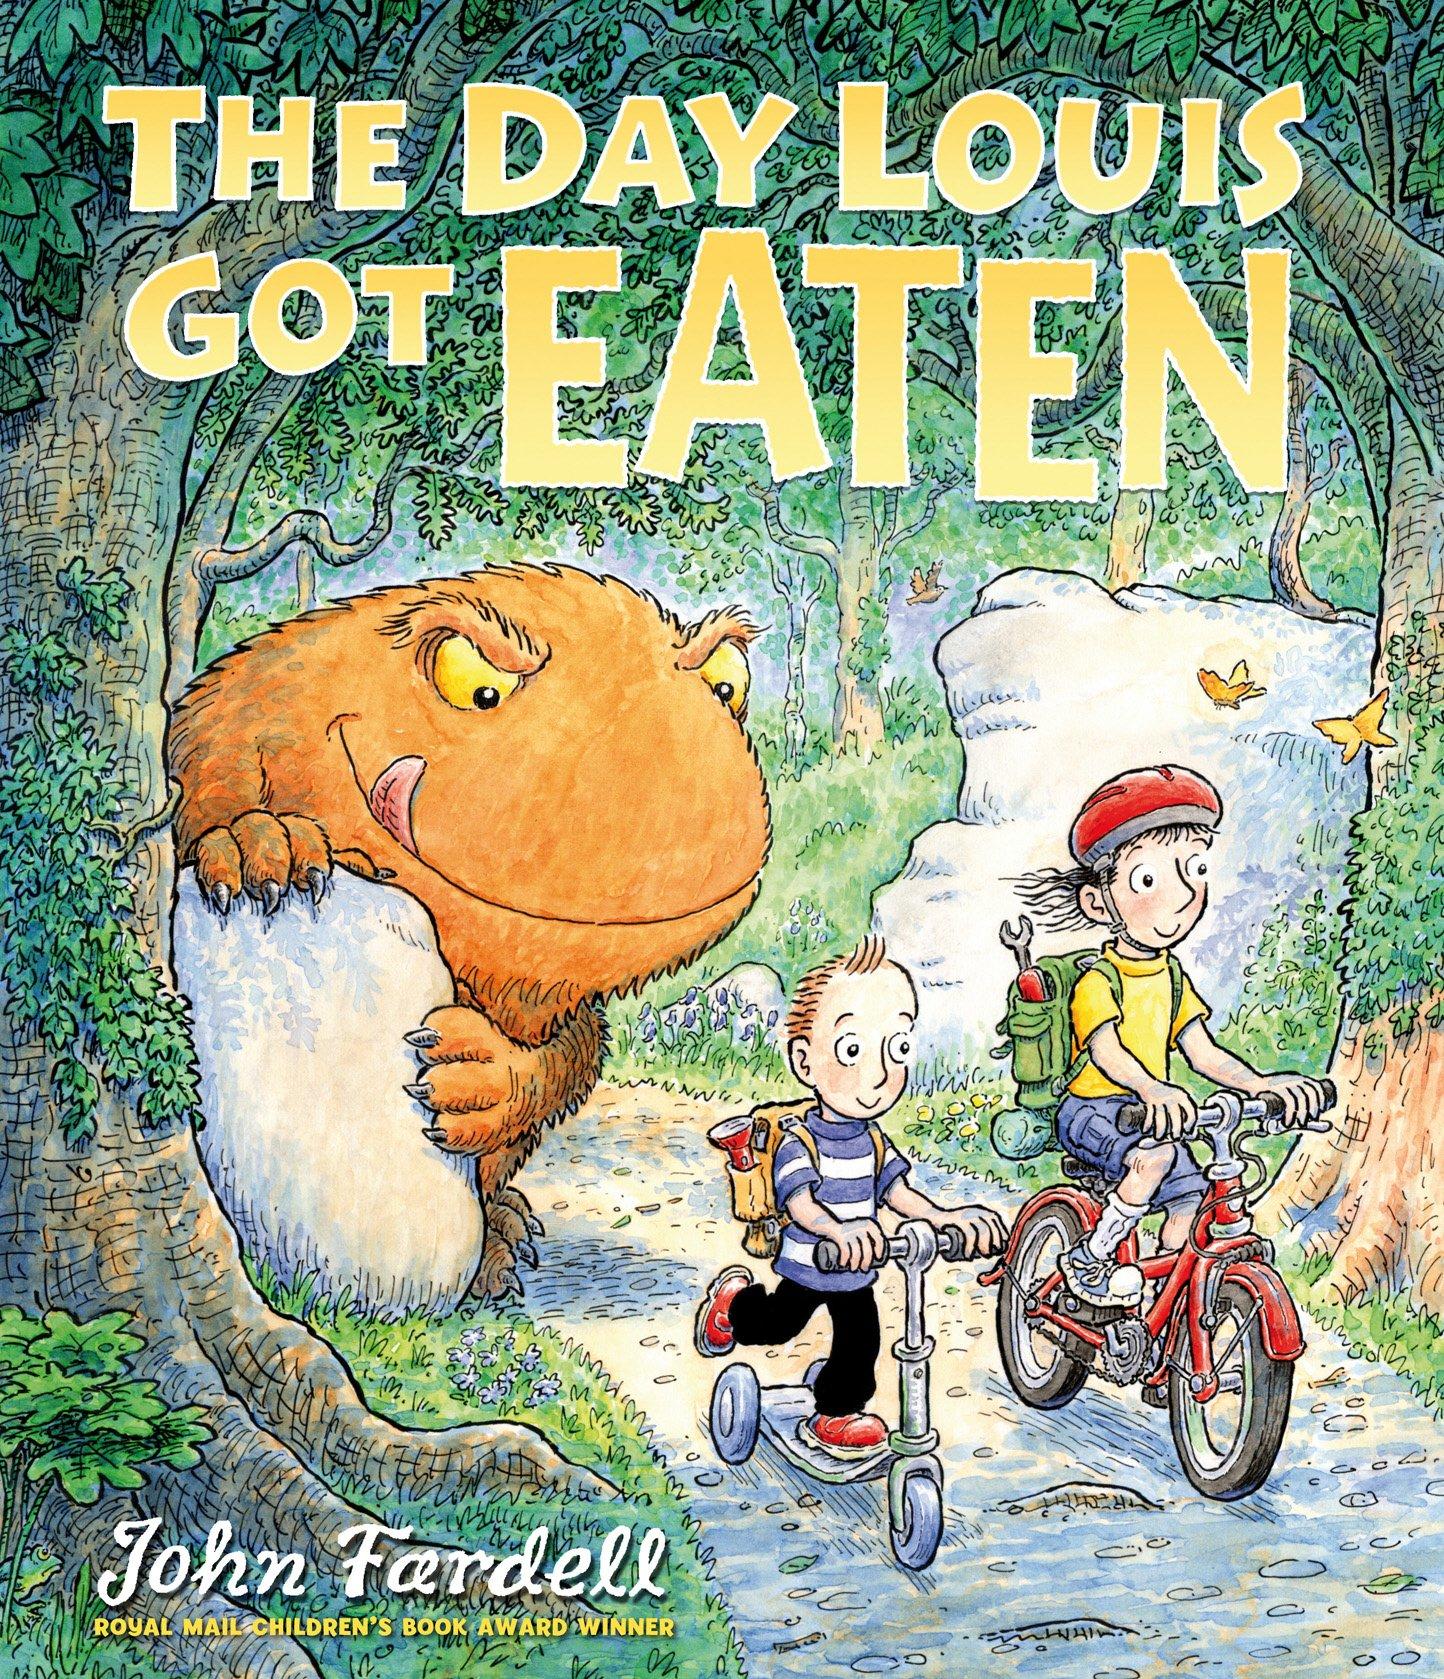 The Day Louis Got Eaten: Amazon.co.uk: Fardell, John: 9781849393874: Books